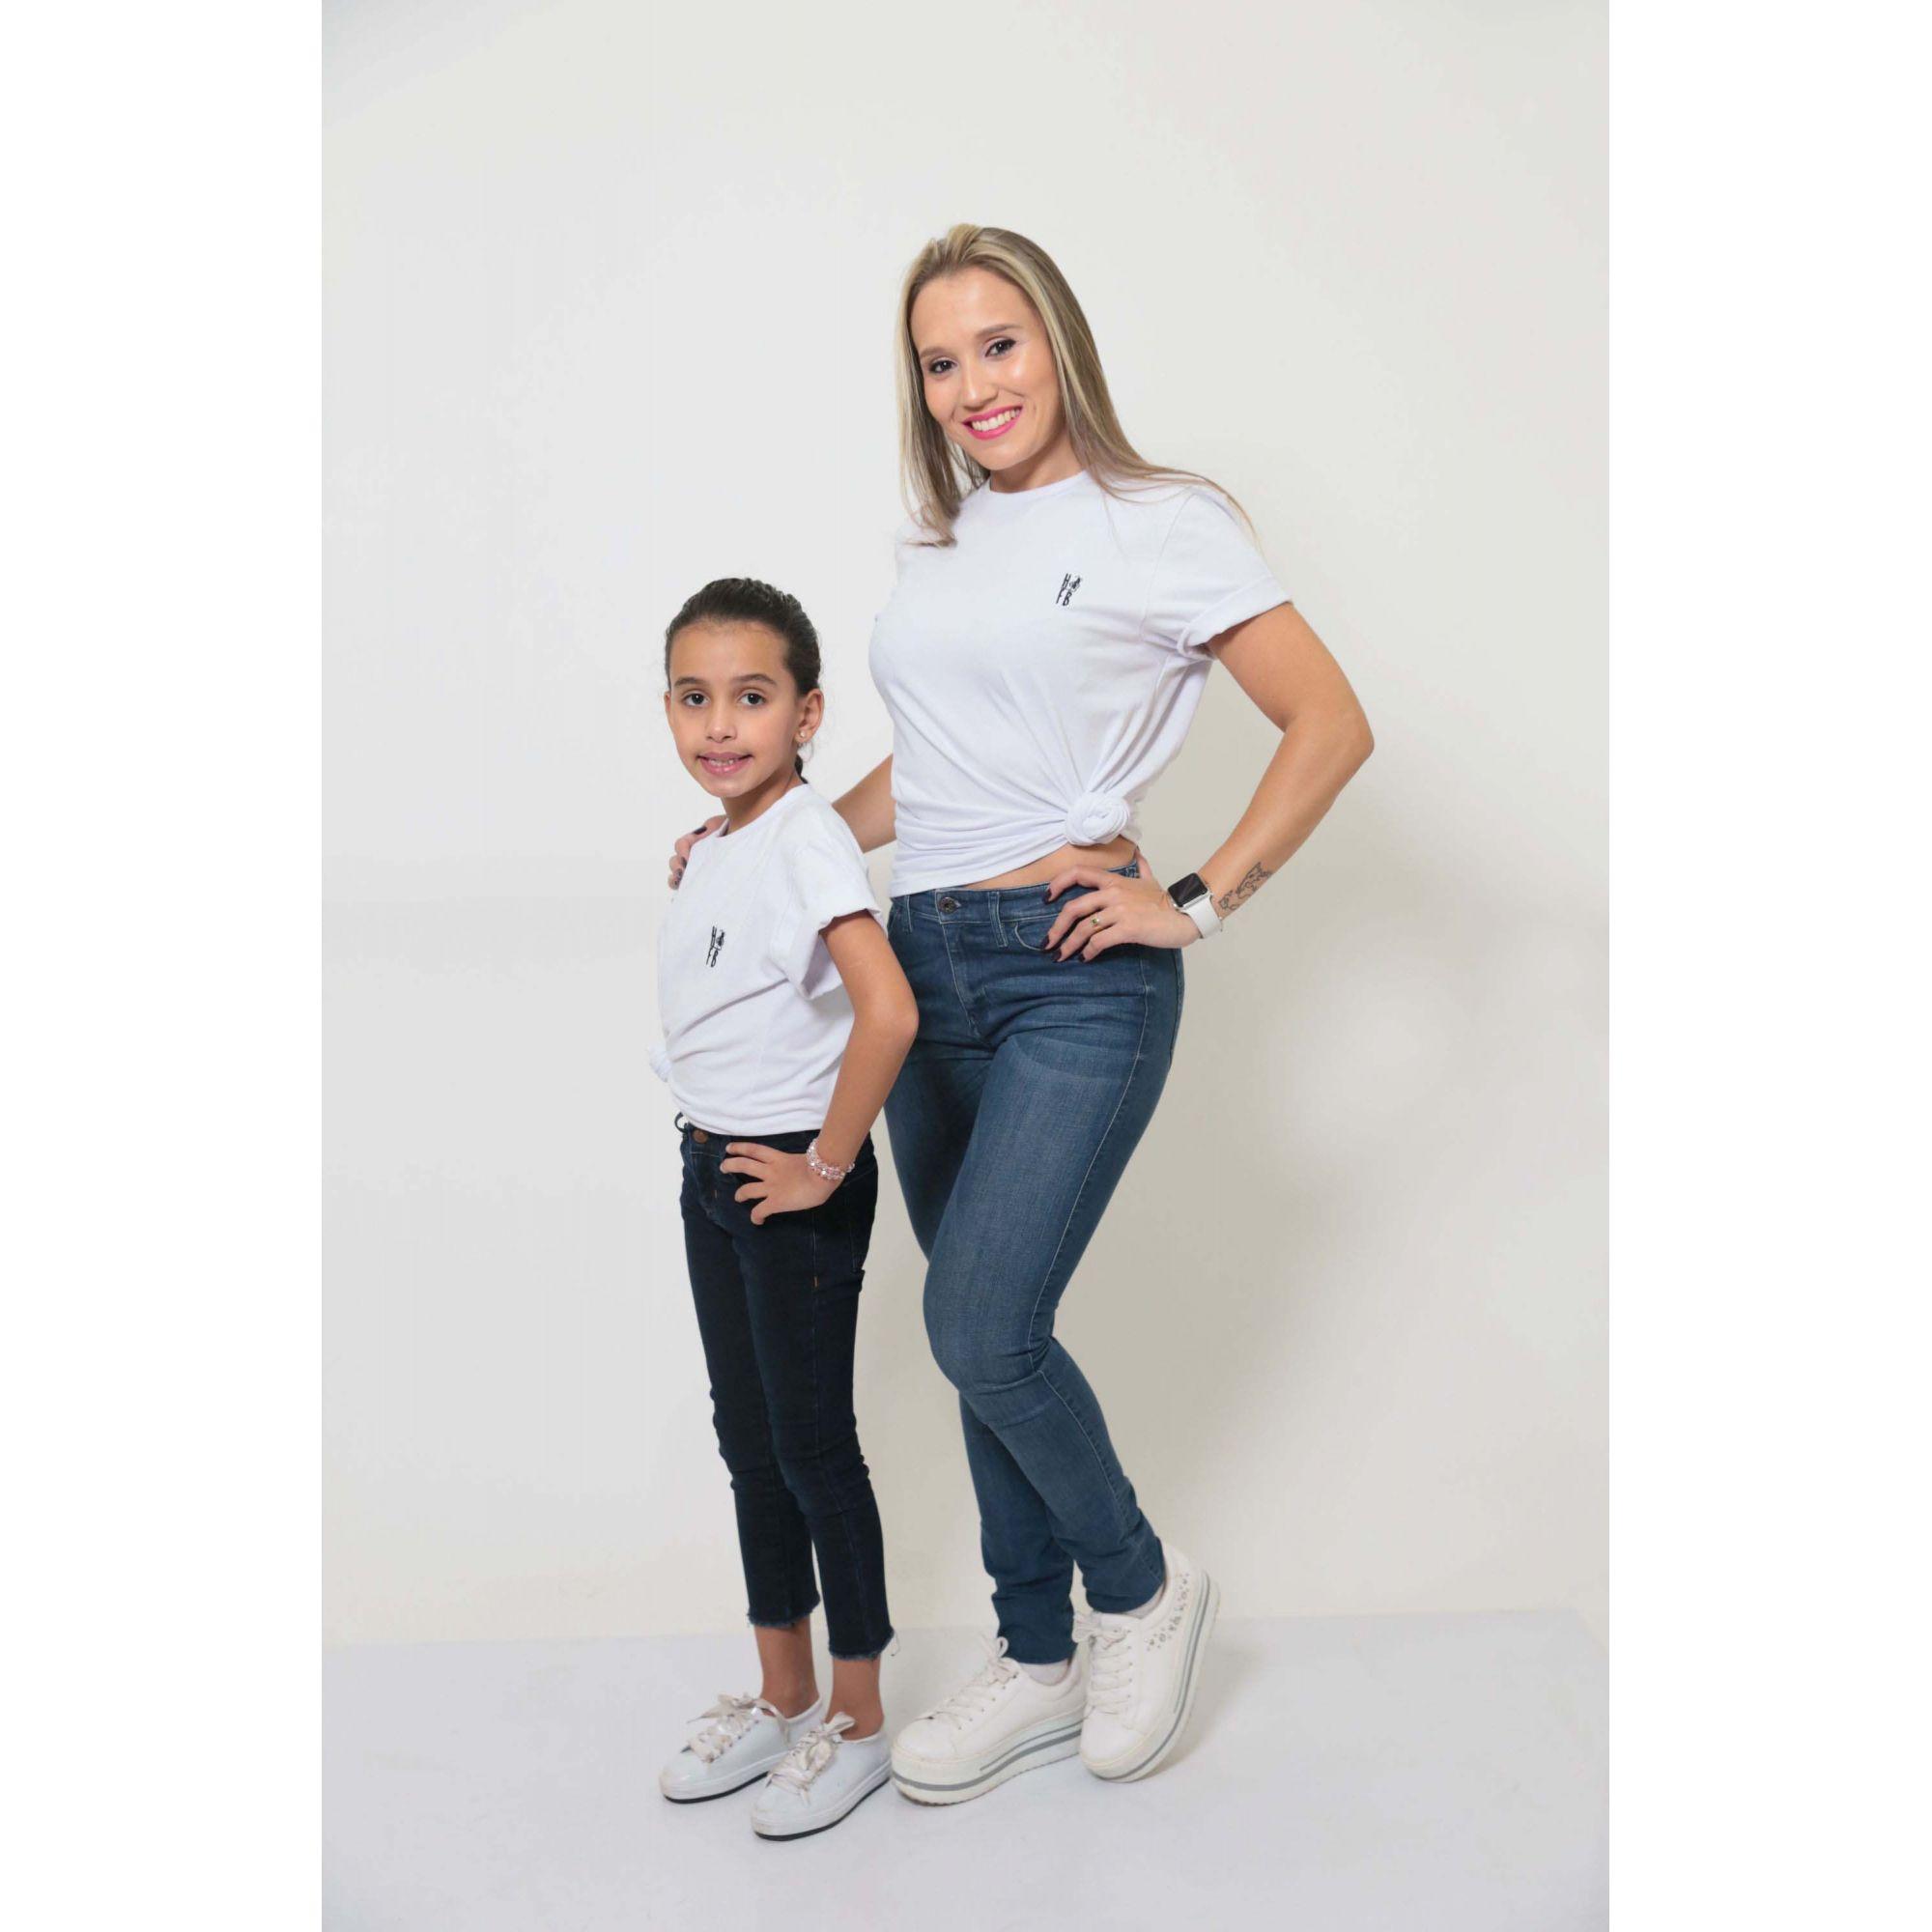 MÃE E FILHA > Kit 02 Peças T-Shirts - Branca Unissex [Coleção Tal Mãe Tal Filha]